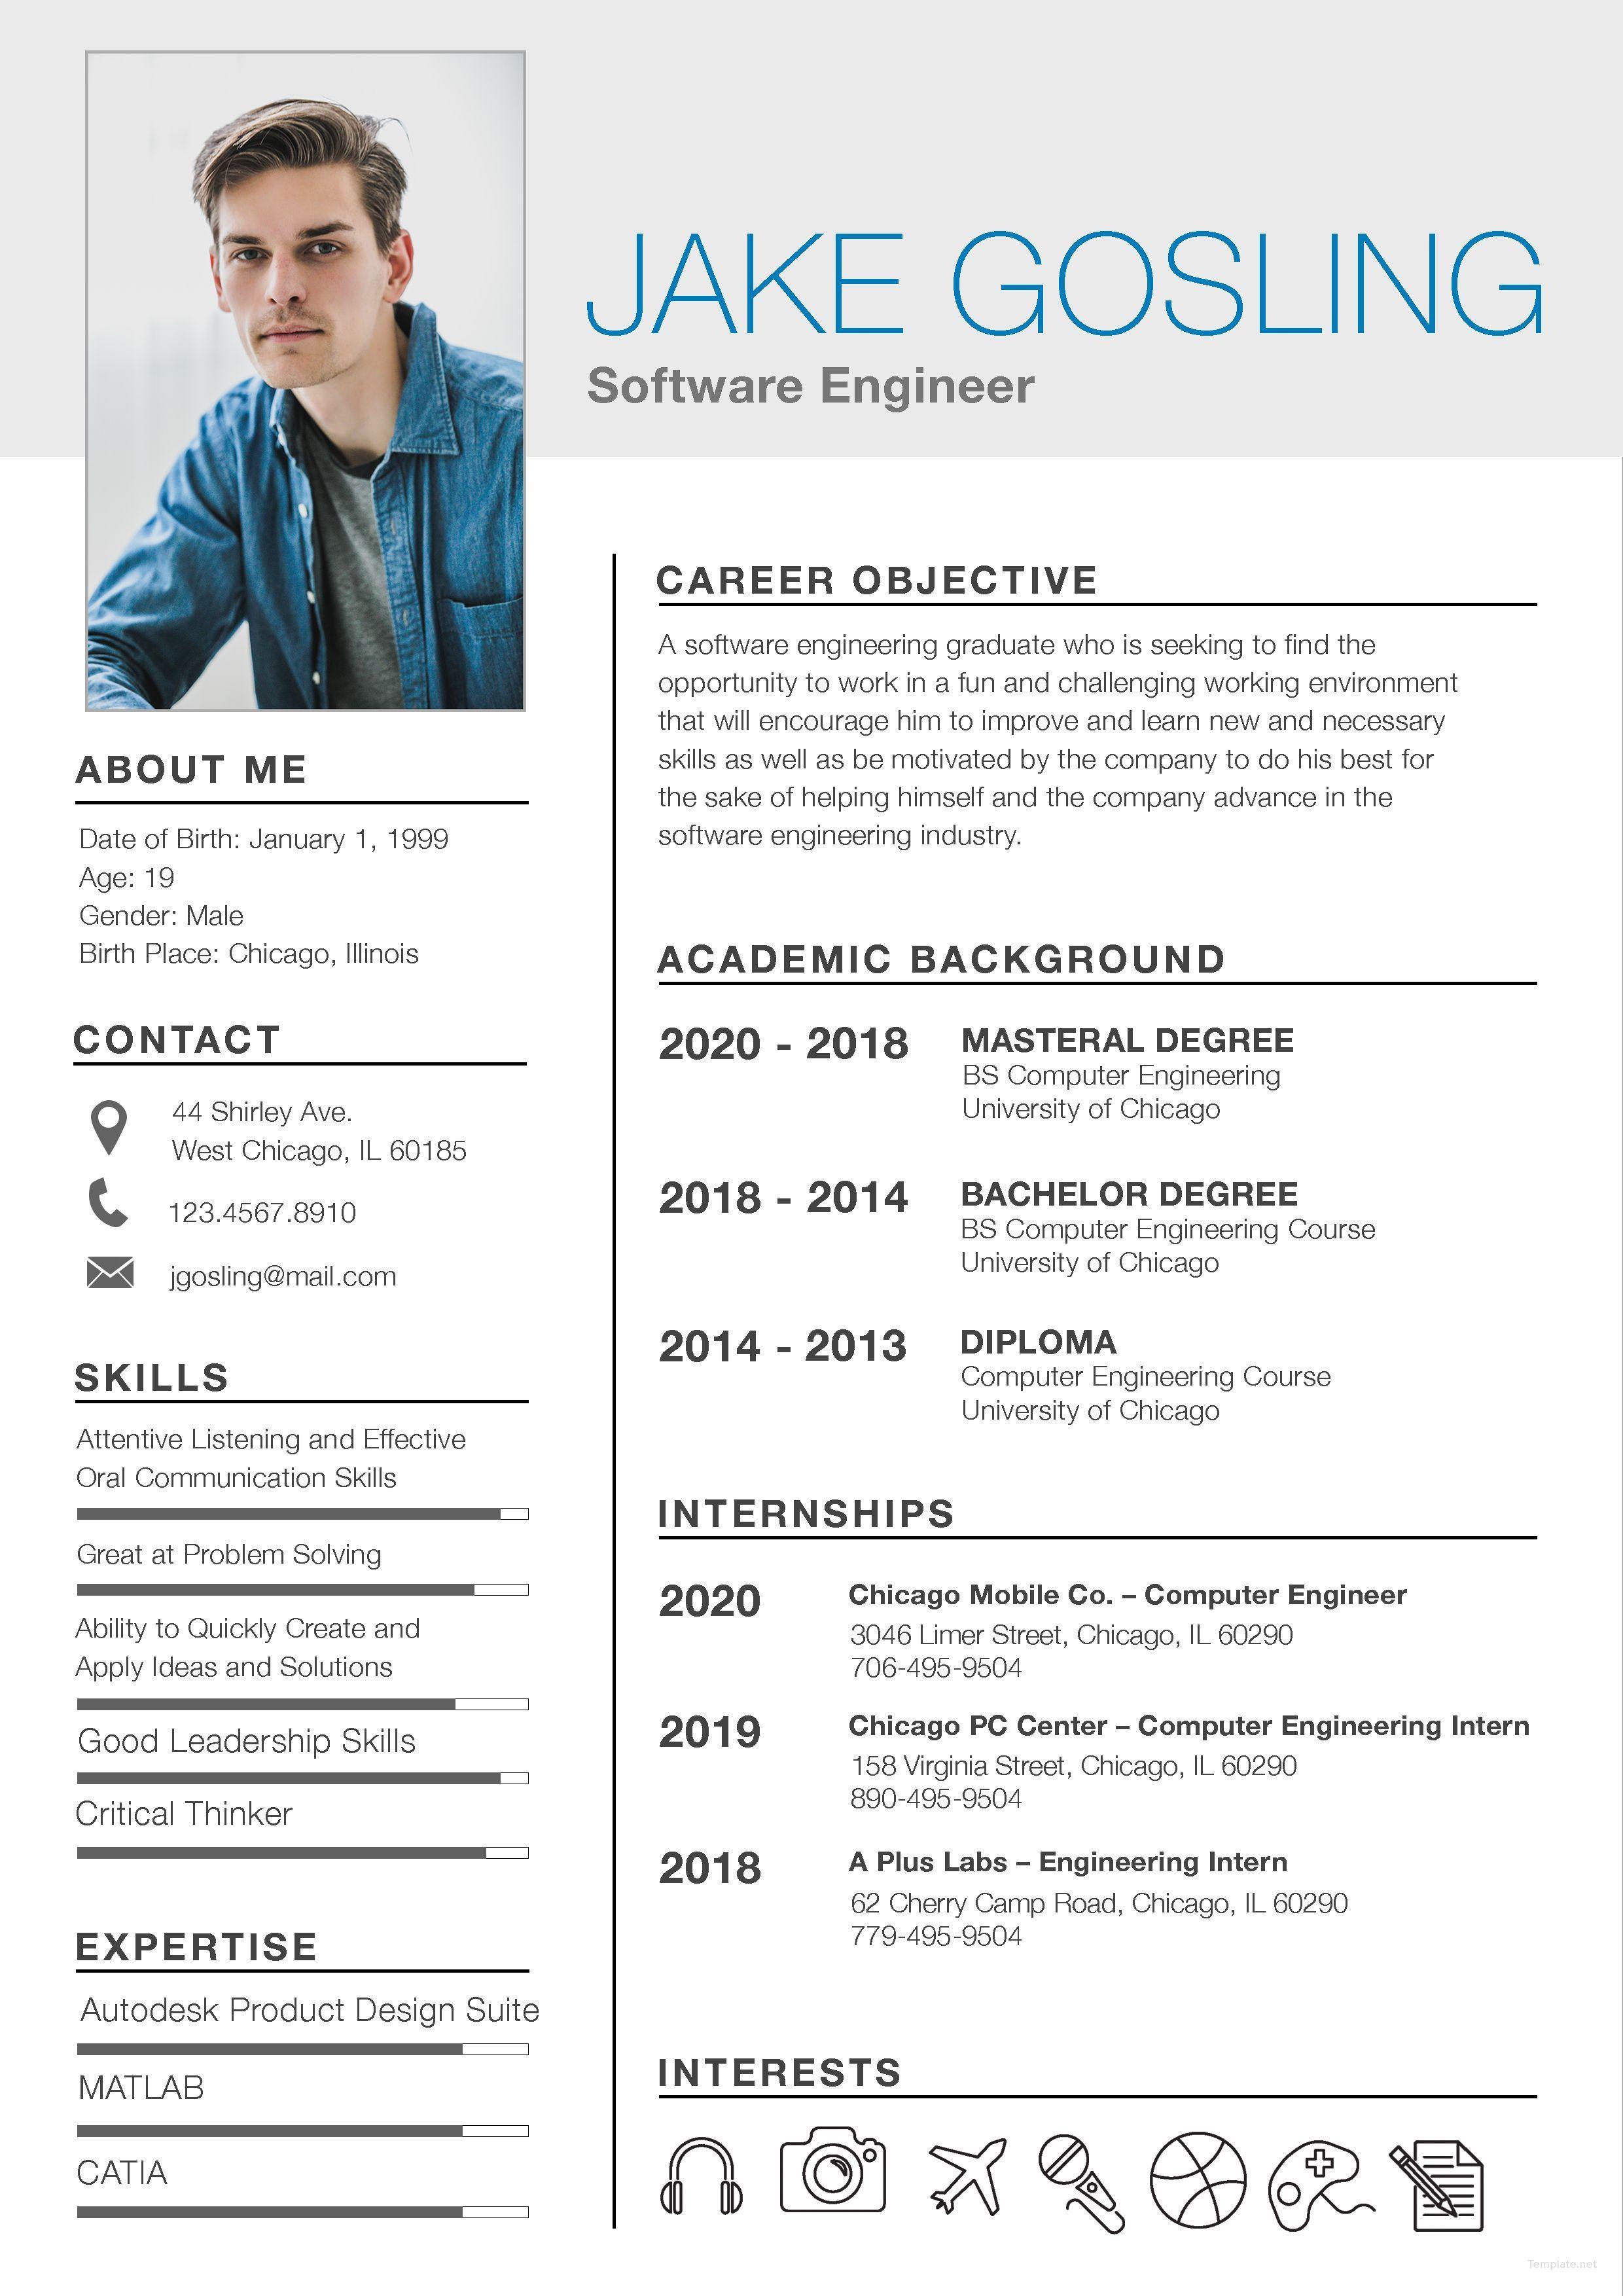 212402 Resumetemplatesfree Free Resume Template Word Student Resume Template Resume Template Word